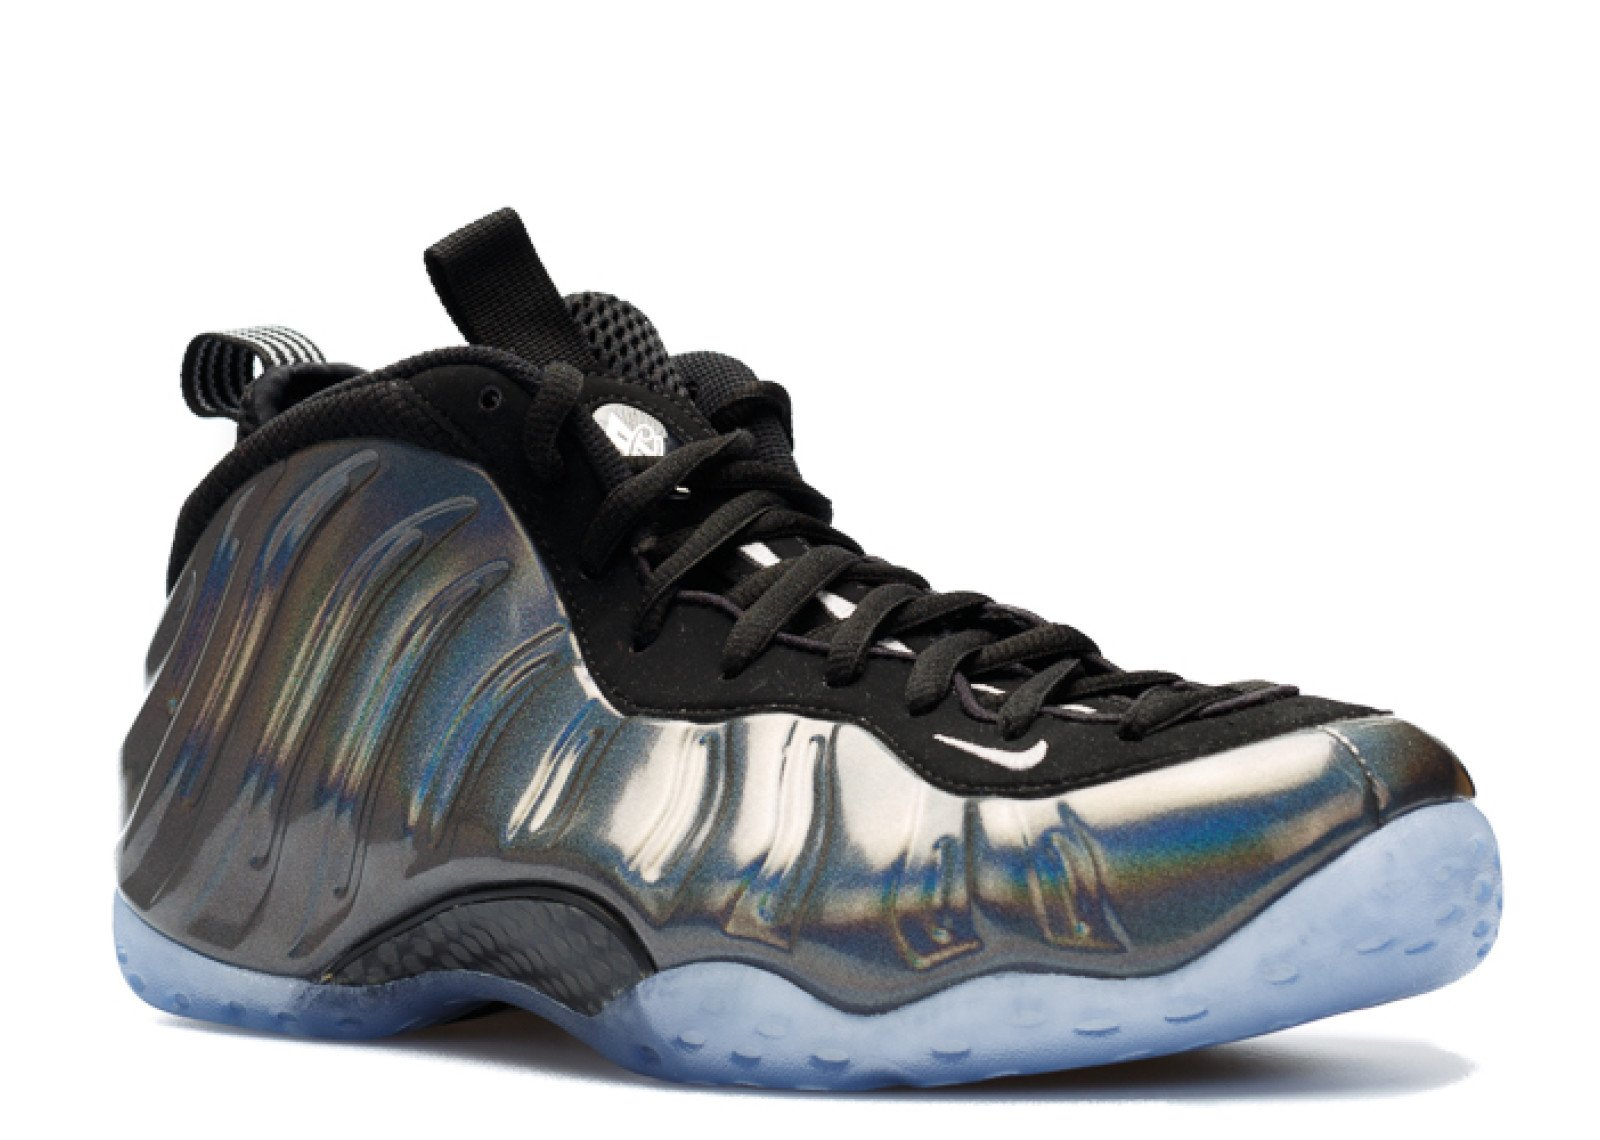 3ae064a2c5a6e Nike Men's Air Foamposite One Basketball Shoes Multi-Color 314996-900 (10)